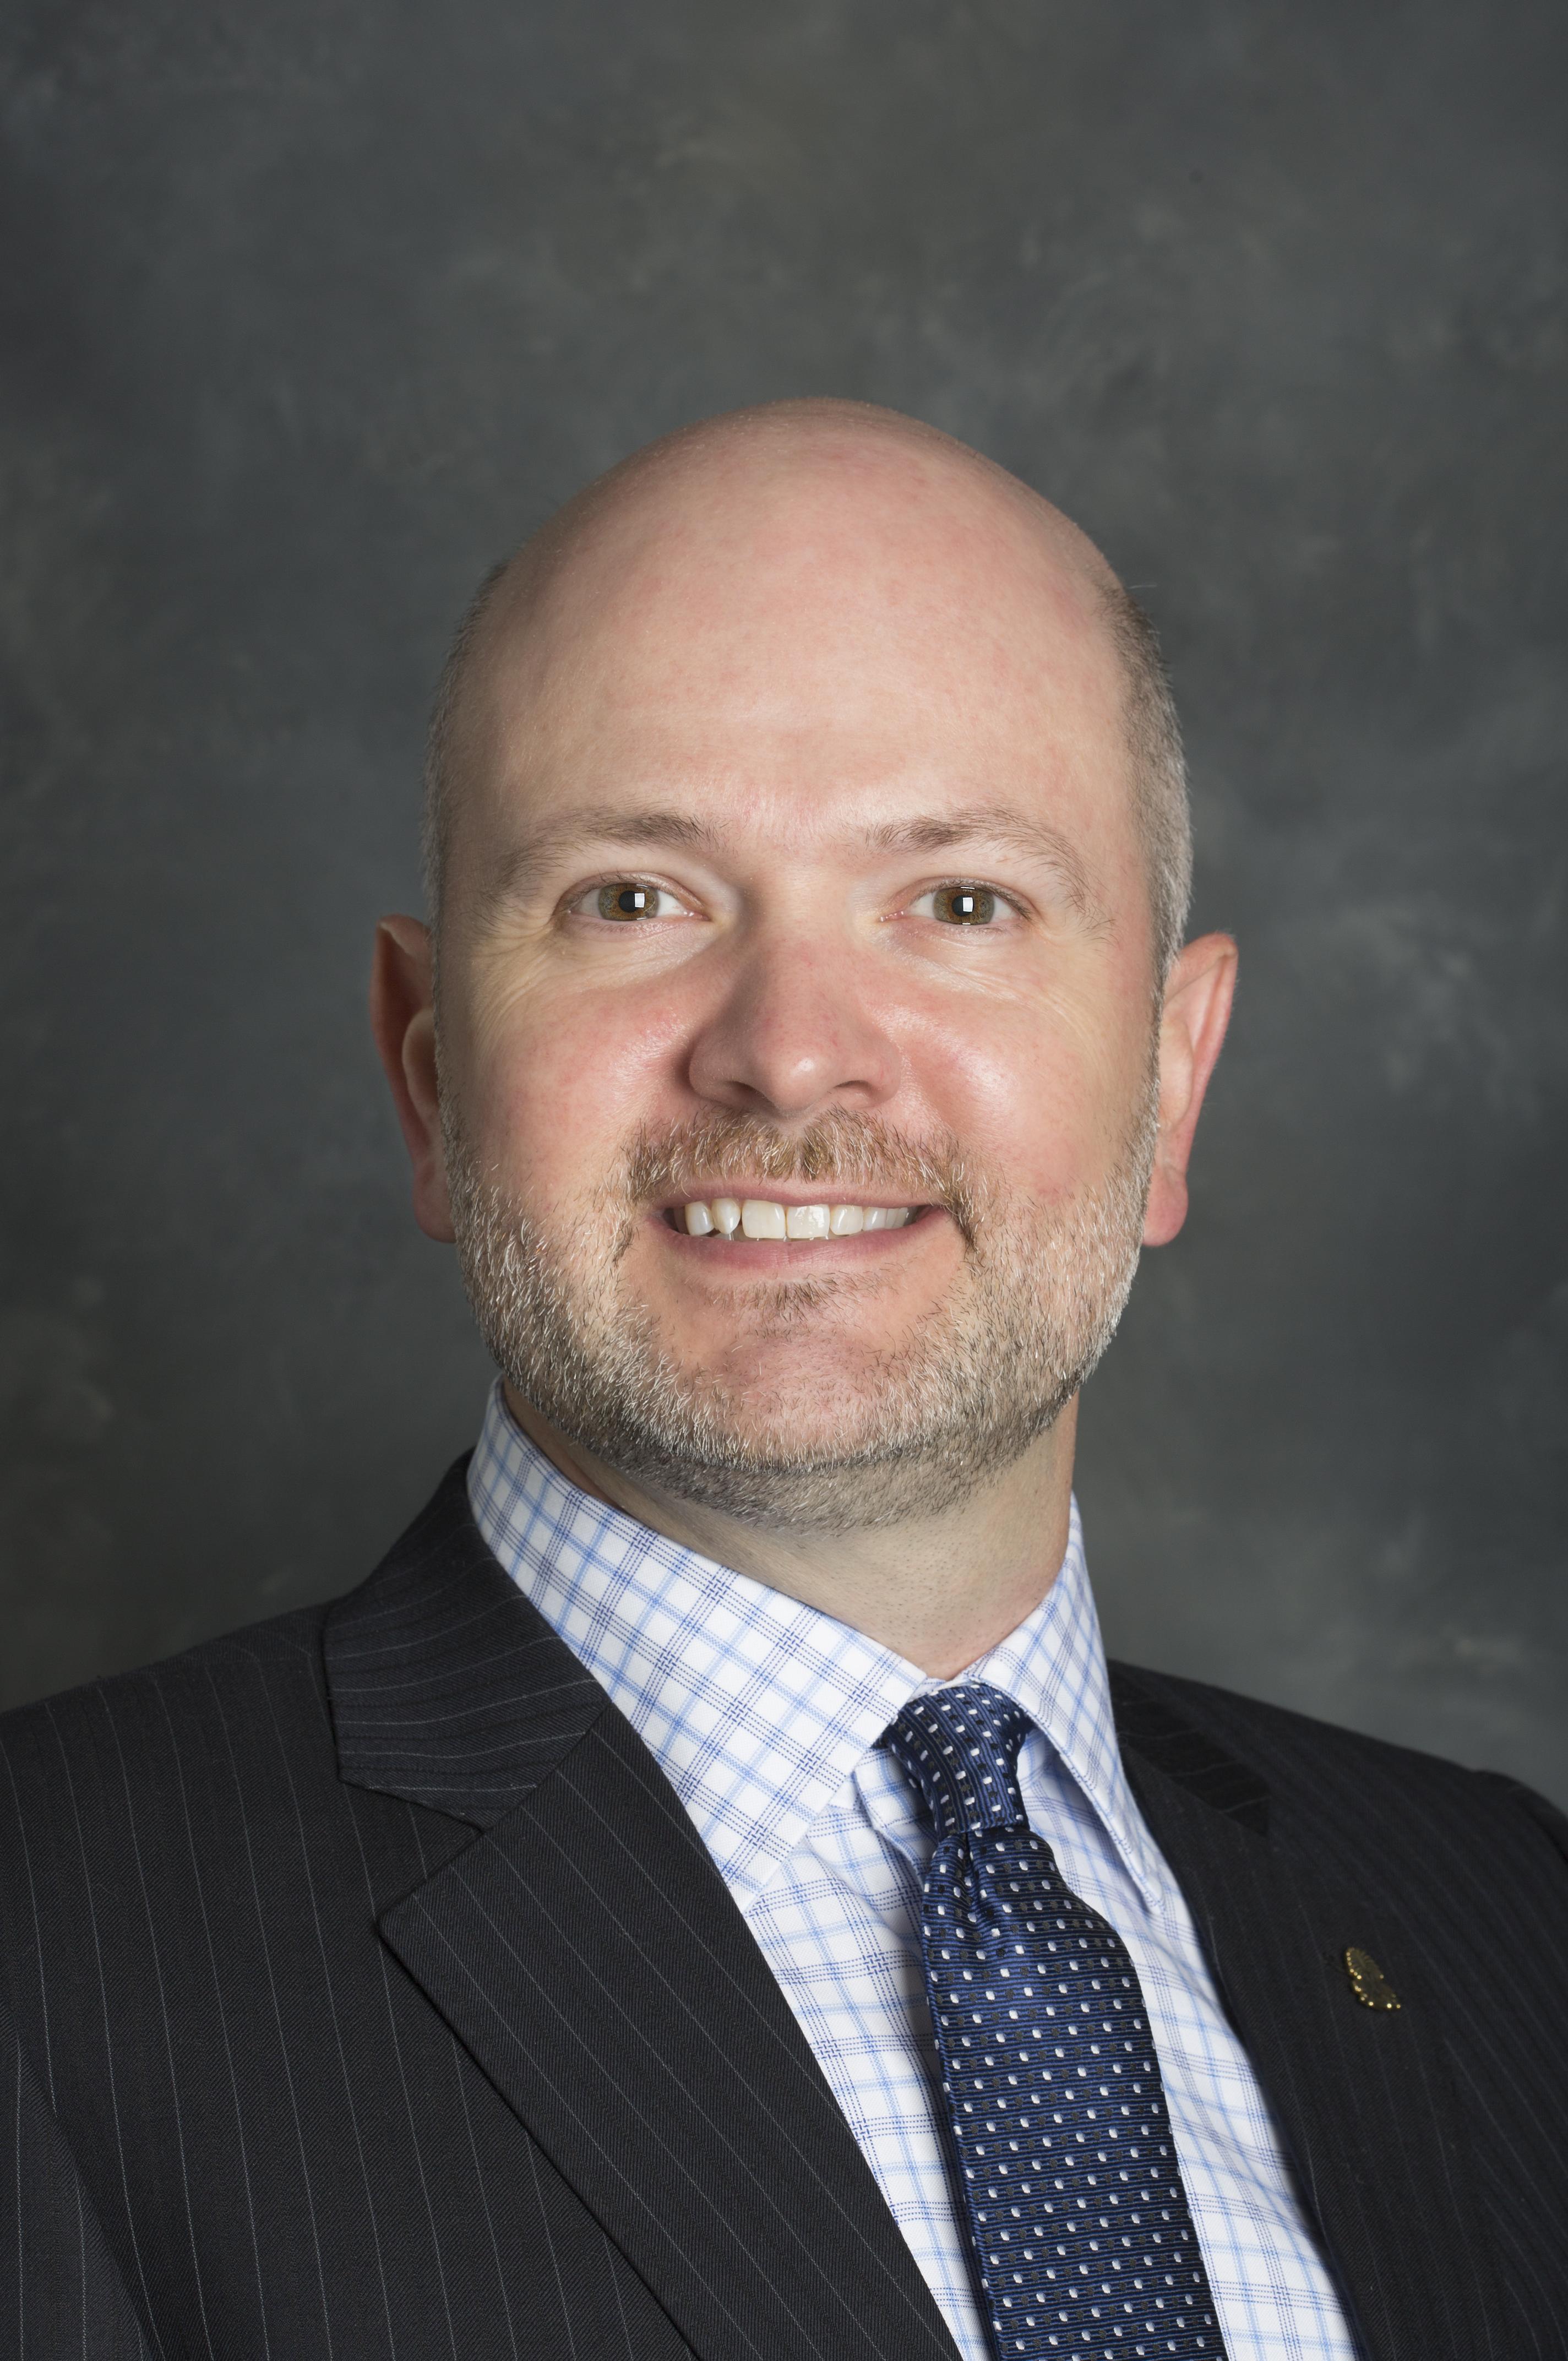 Kirk Foster